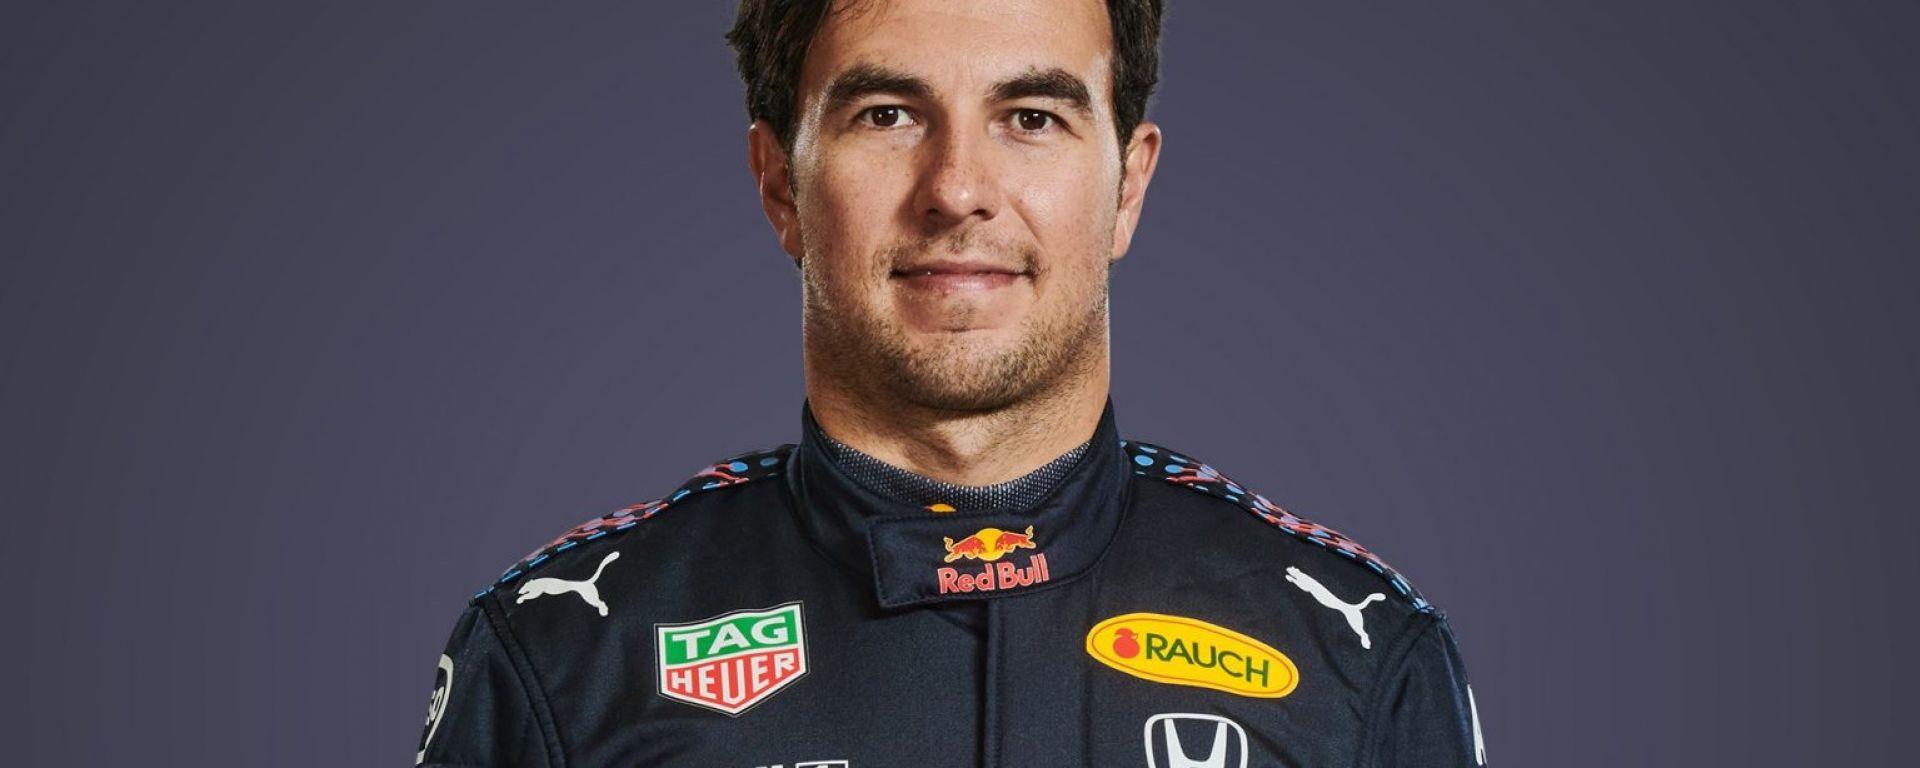 F1 2021, Sergio Perez (Red Bull Racing)